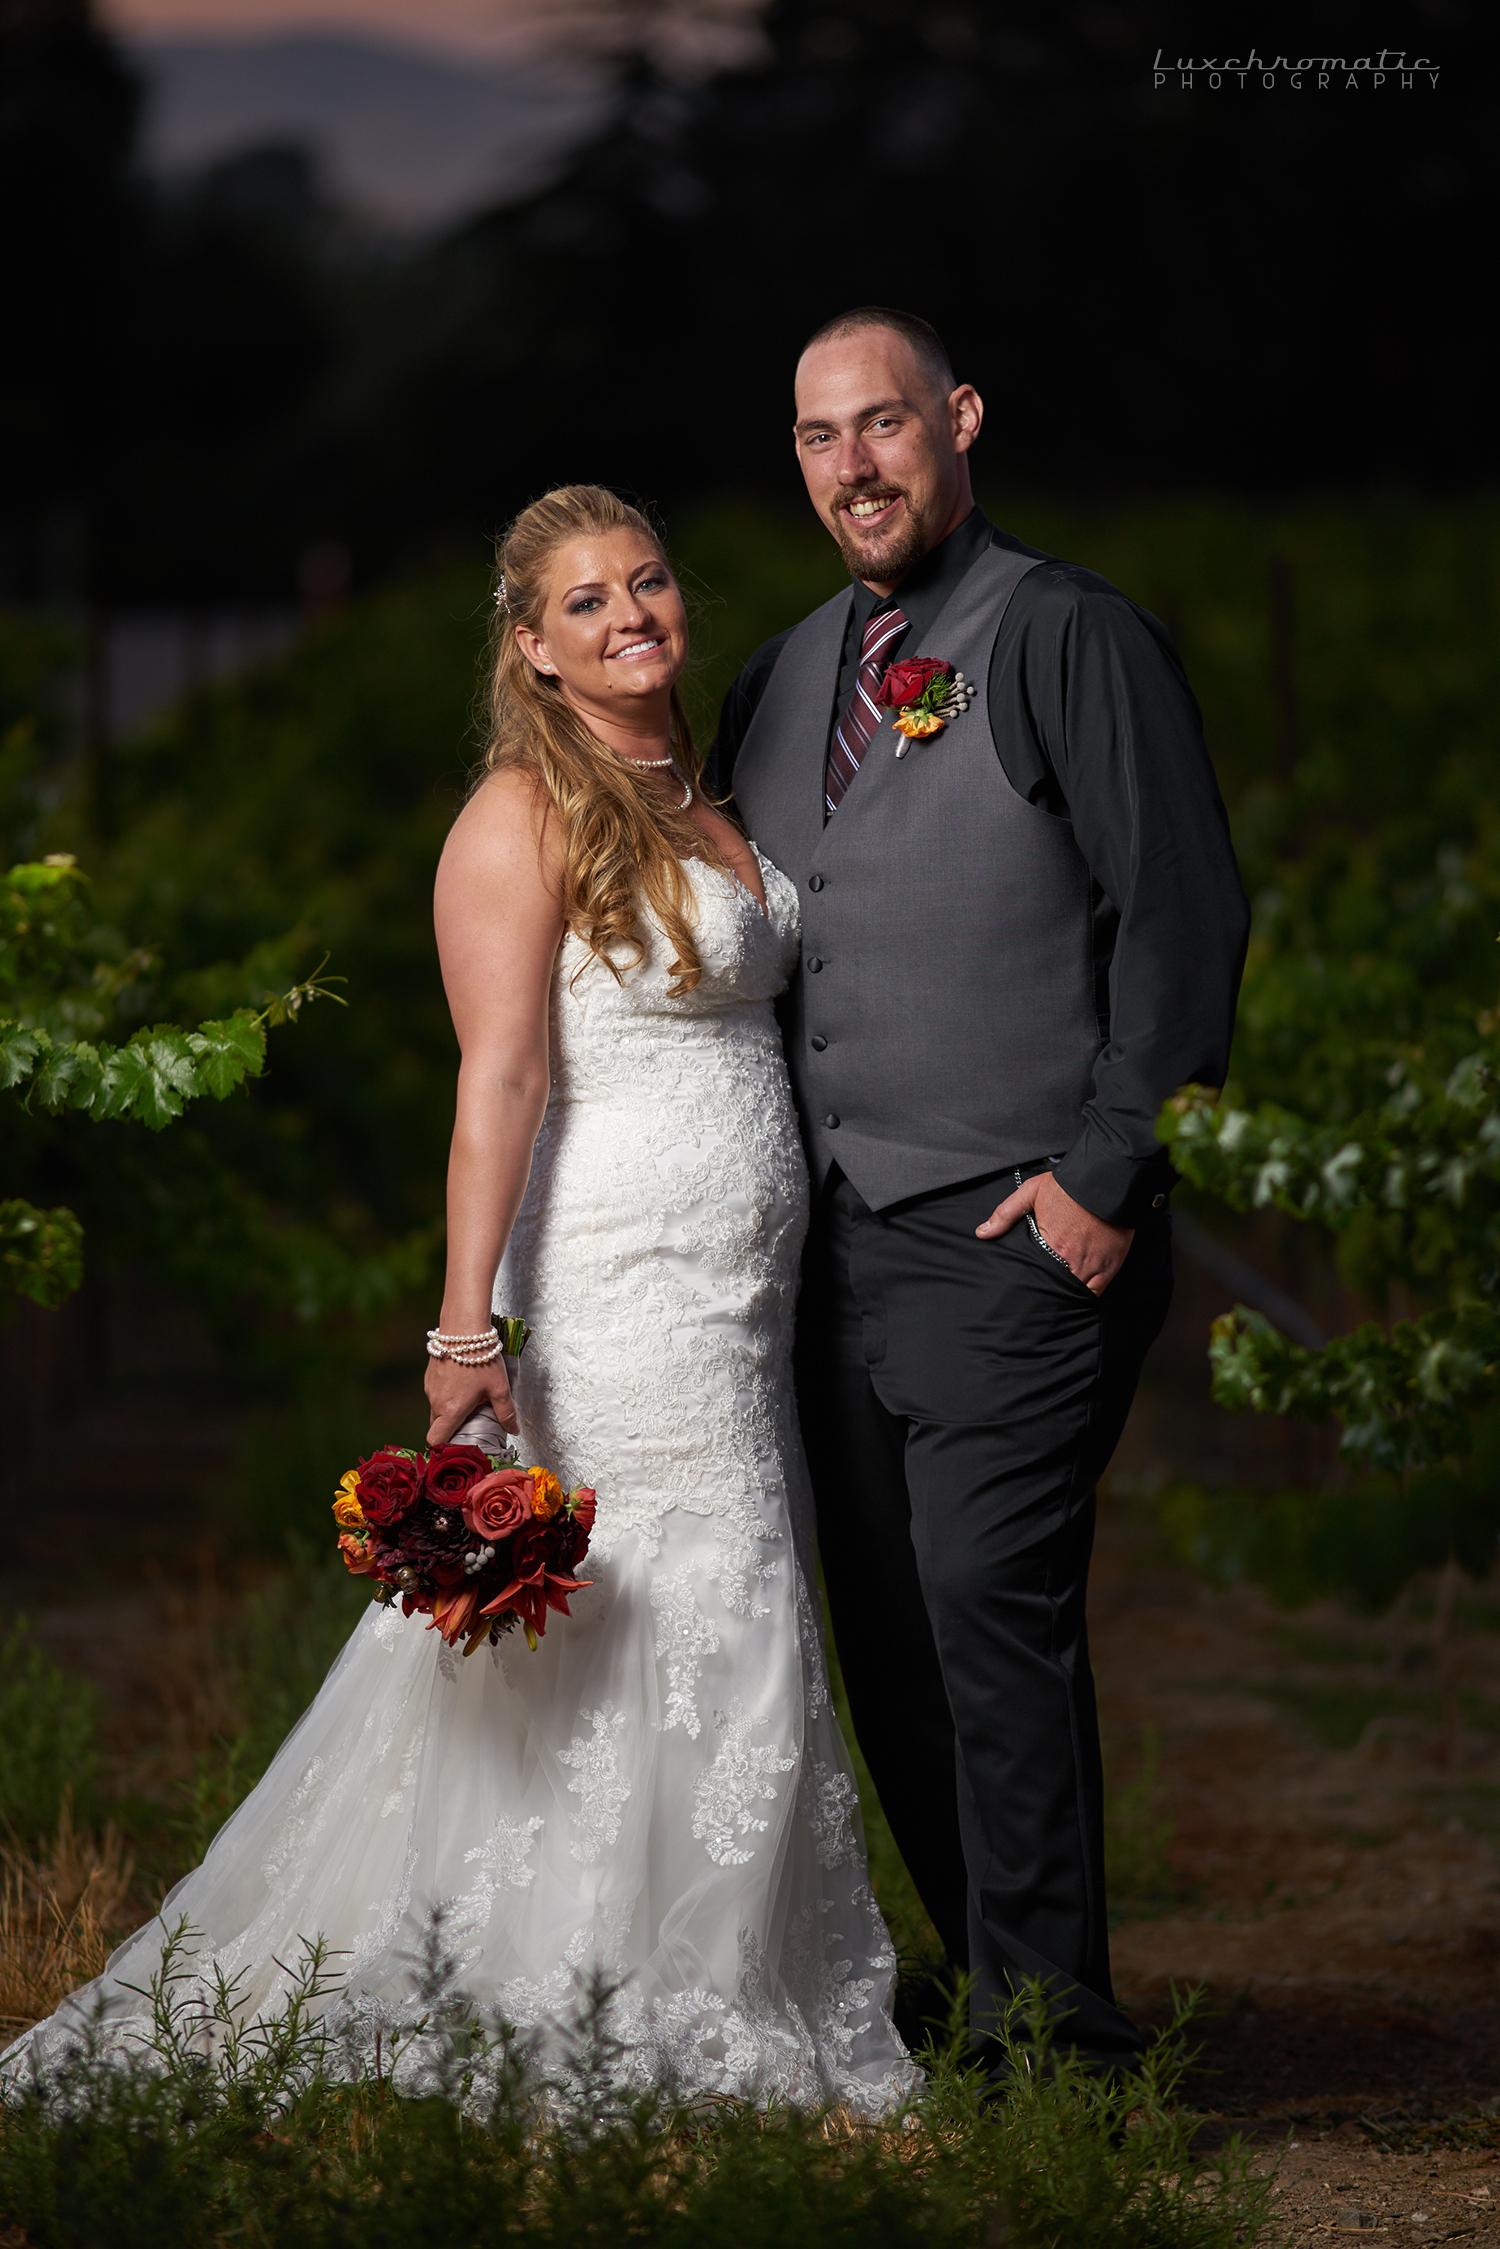 081217_Rachel_Chris_a0734-weddingdress-bride-weddingphotography-weddingphotographer-bridal-groom-wedding-engagementring-proposal-brides-diamondring-sonyalpha-sony-sonya9-sonya7rii-sanfrancisco-sf-bayarea-photographer-profoto-murrietas-well.jpg